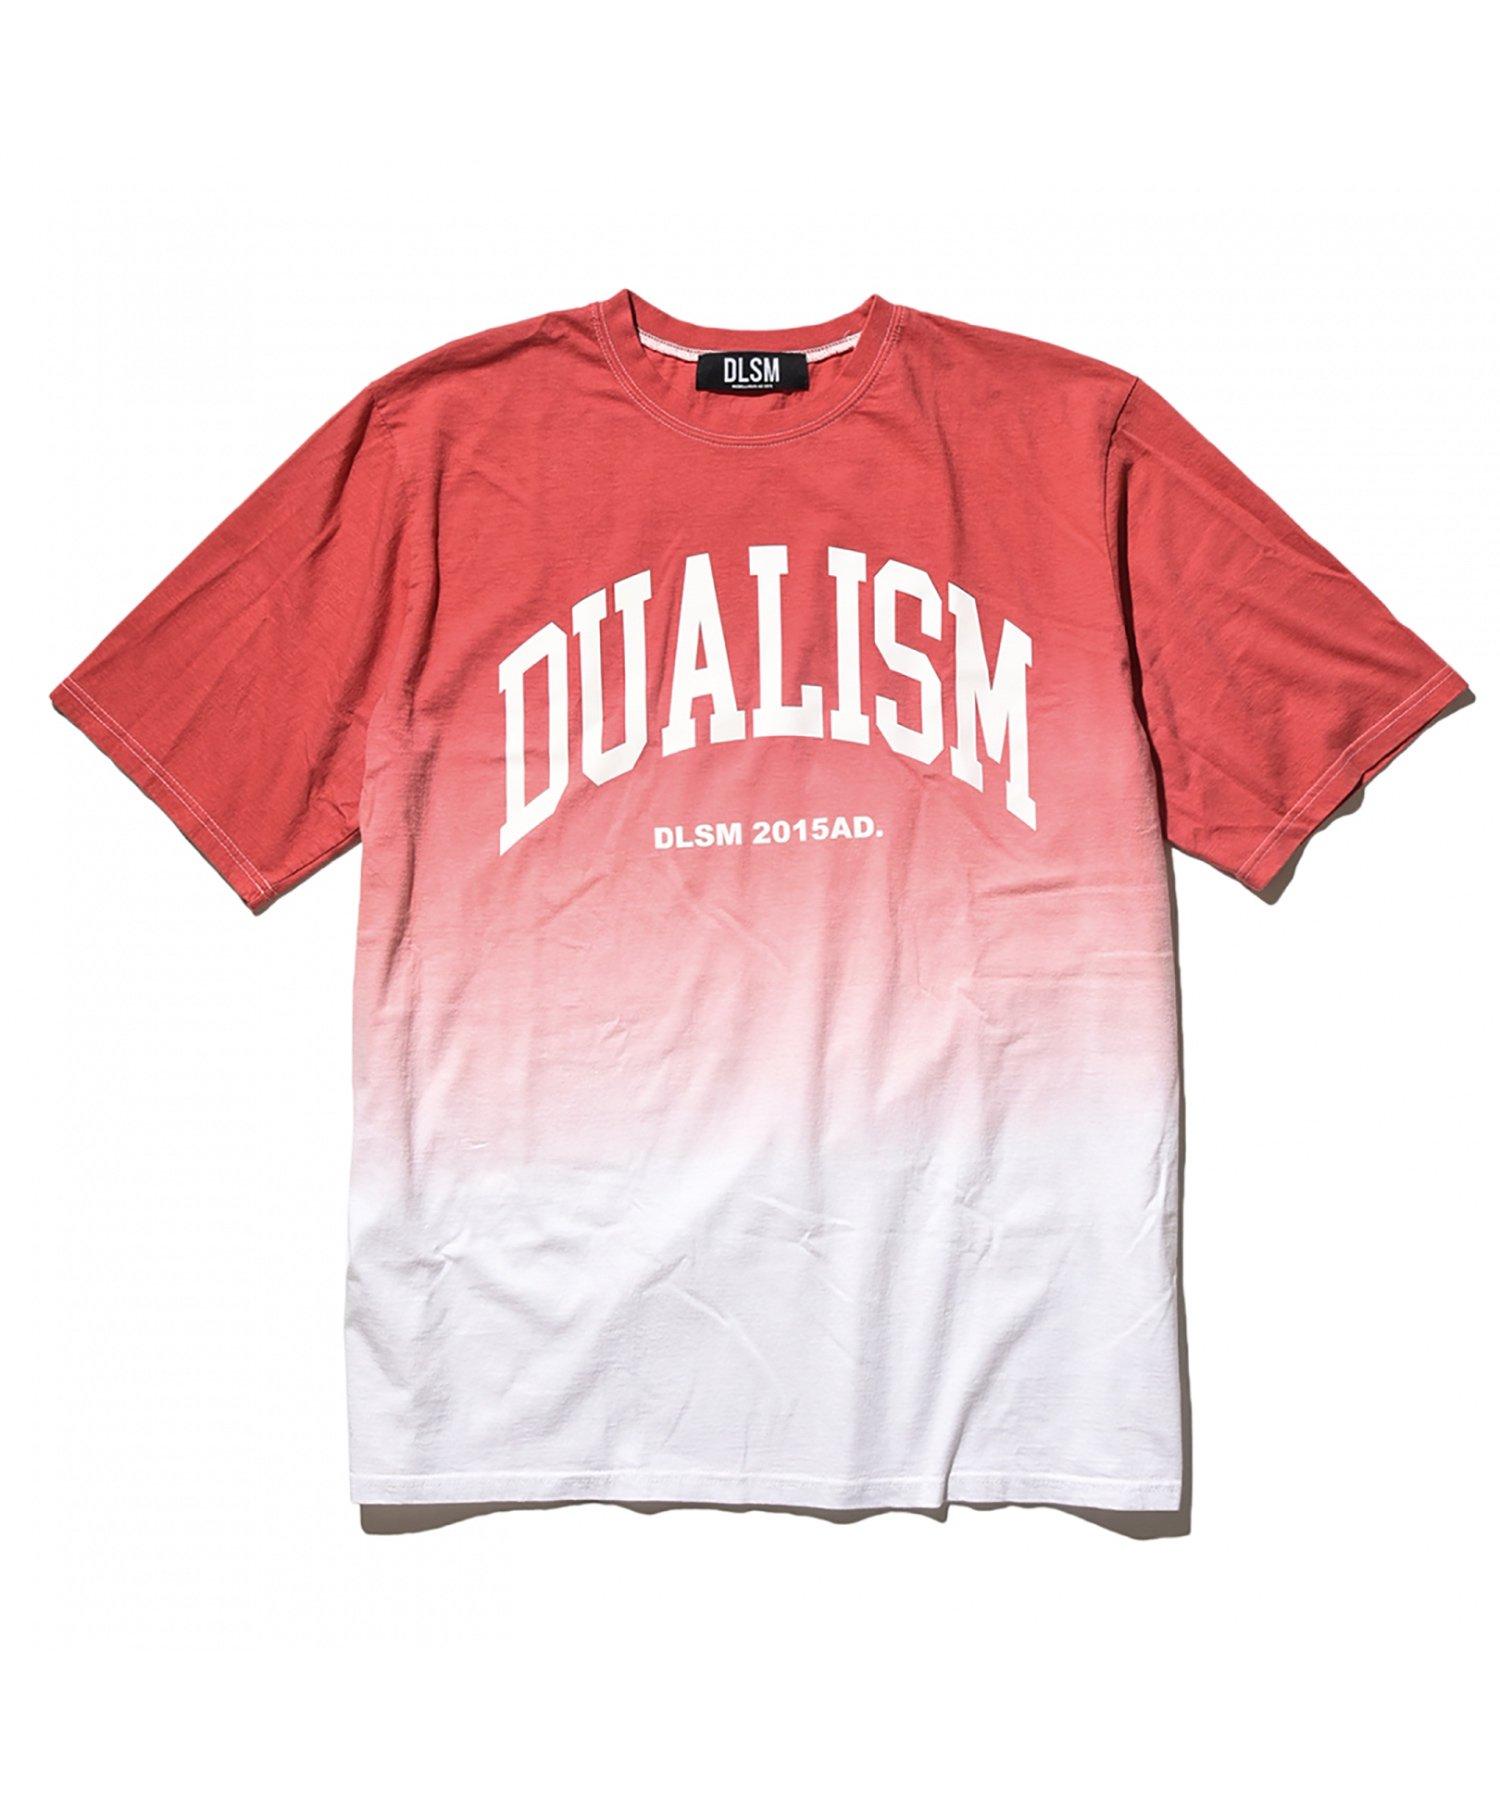 DUALISM UV ARCH LOGO GRADATION TEE